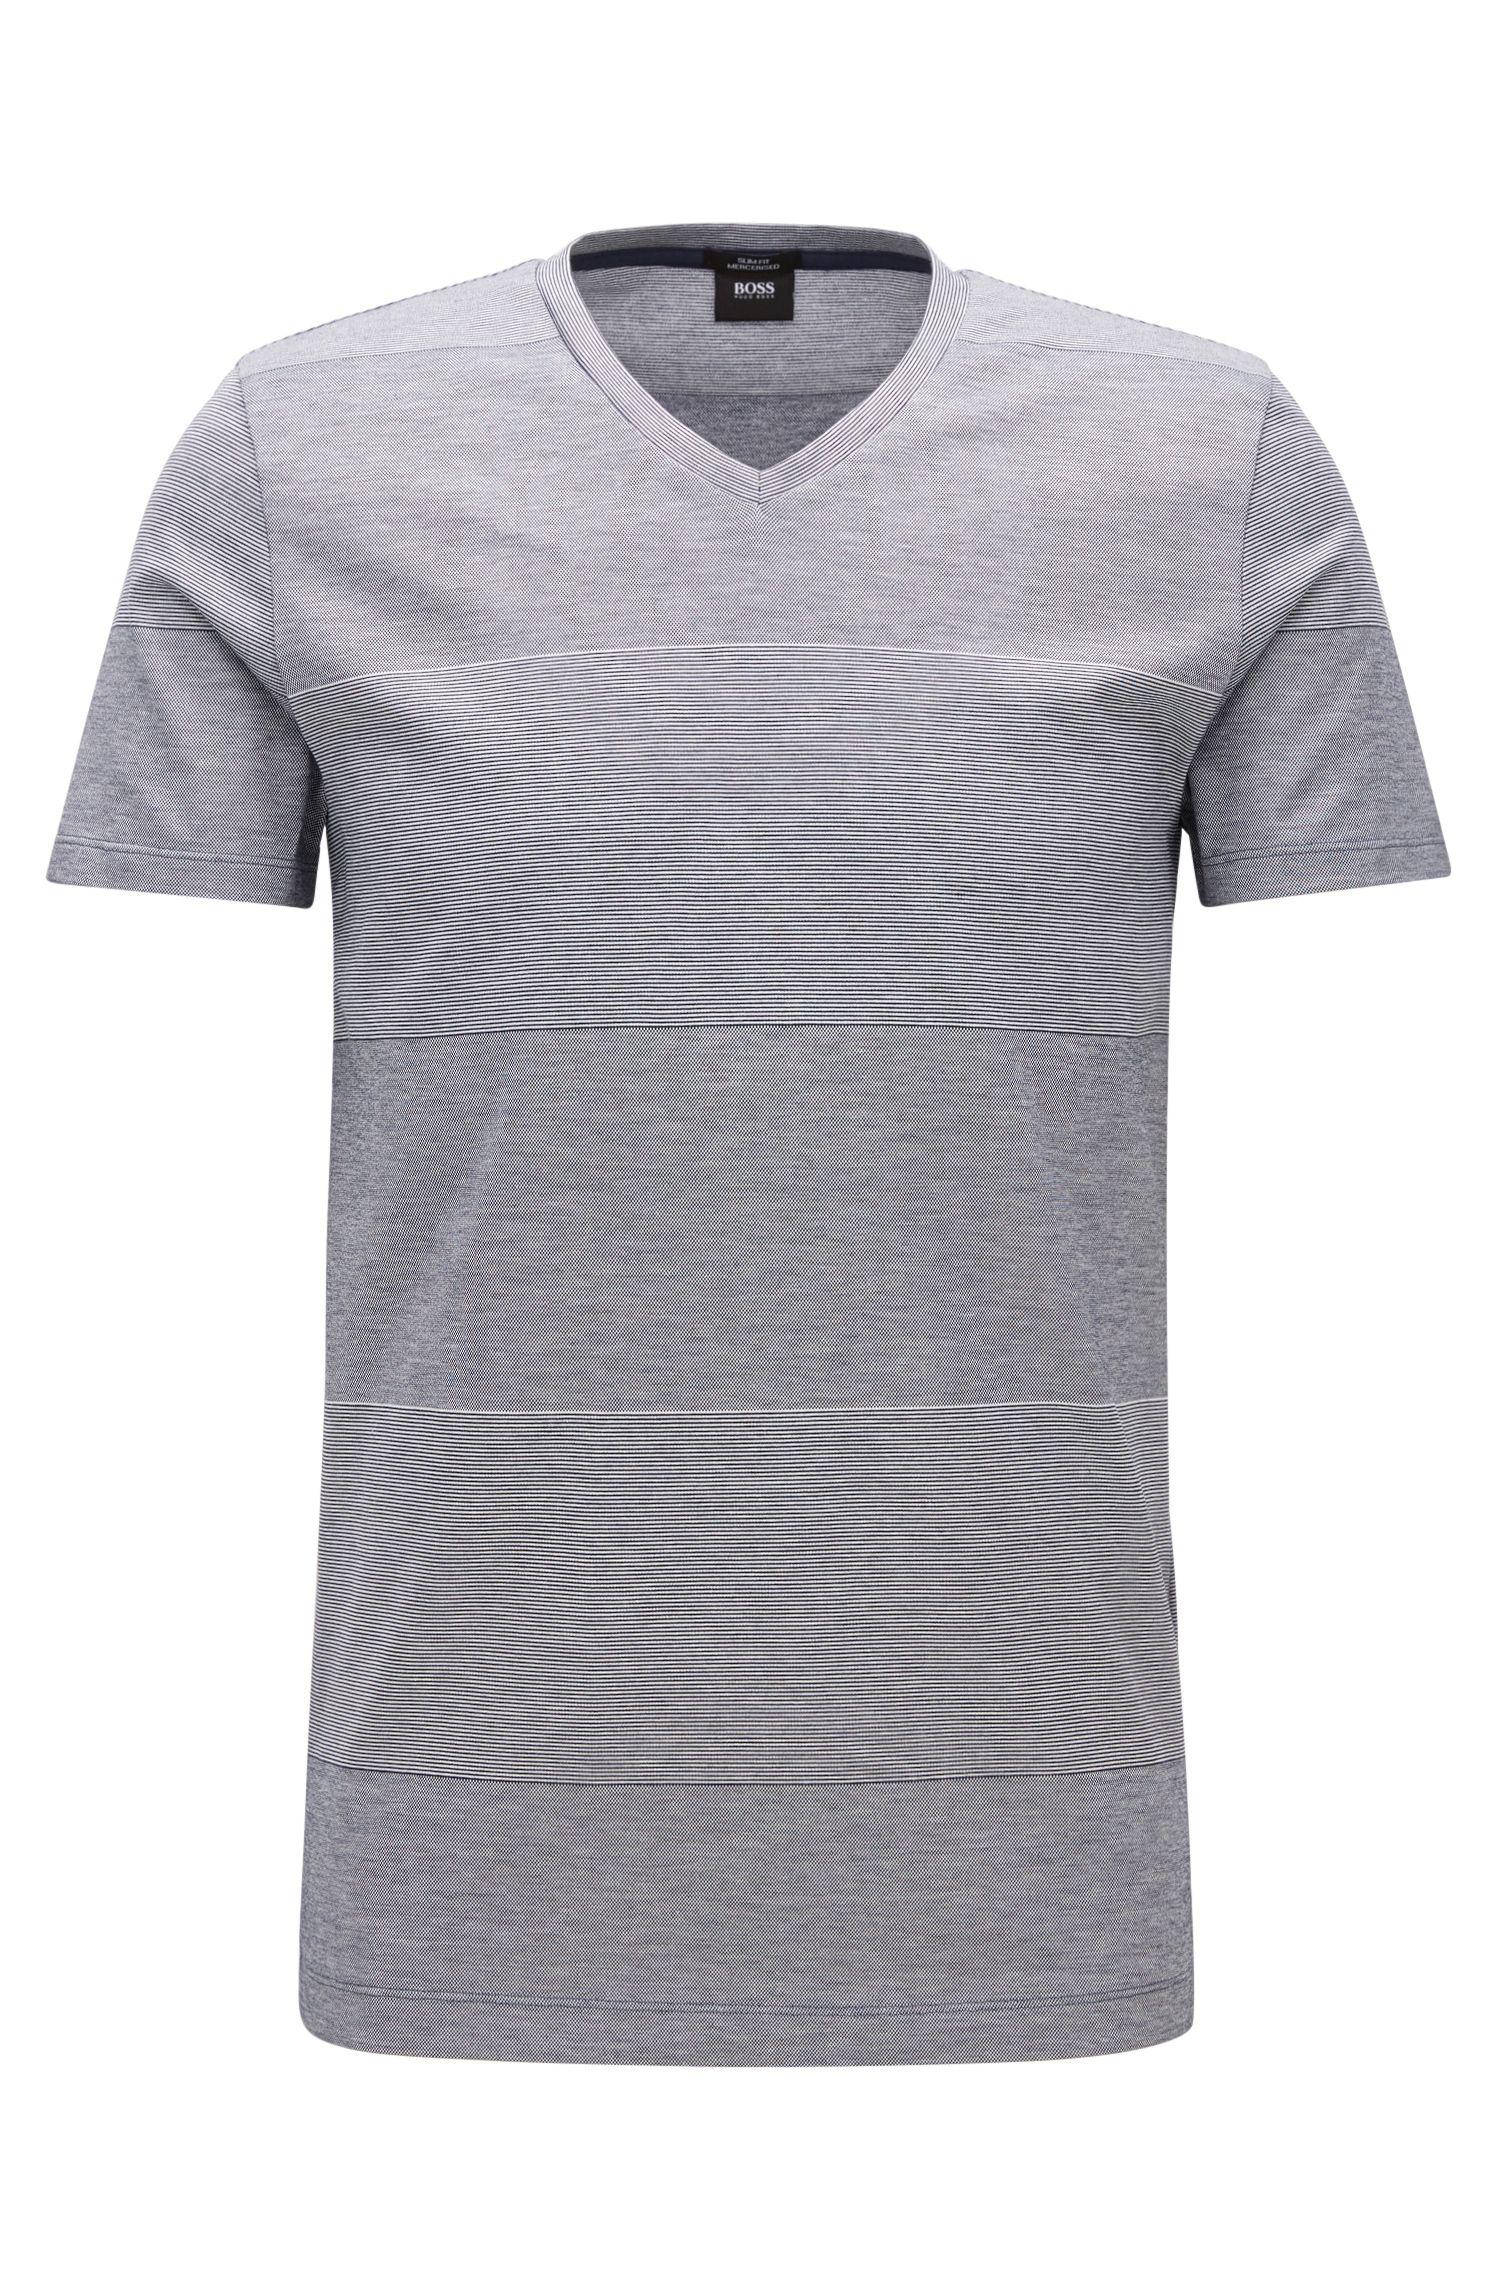 Block striped slim-fit T-shirt in mercerised cotton